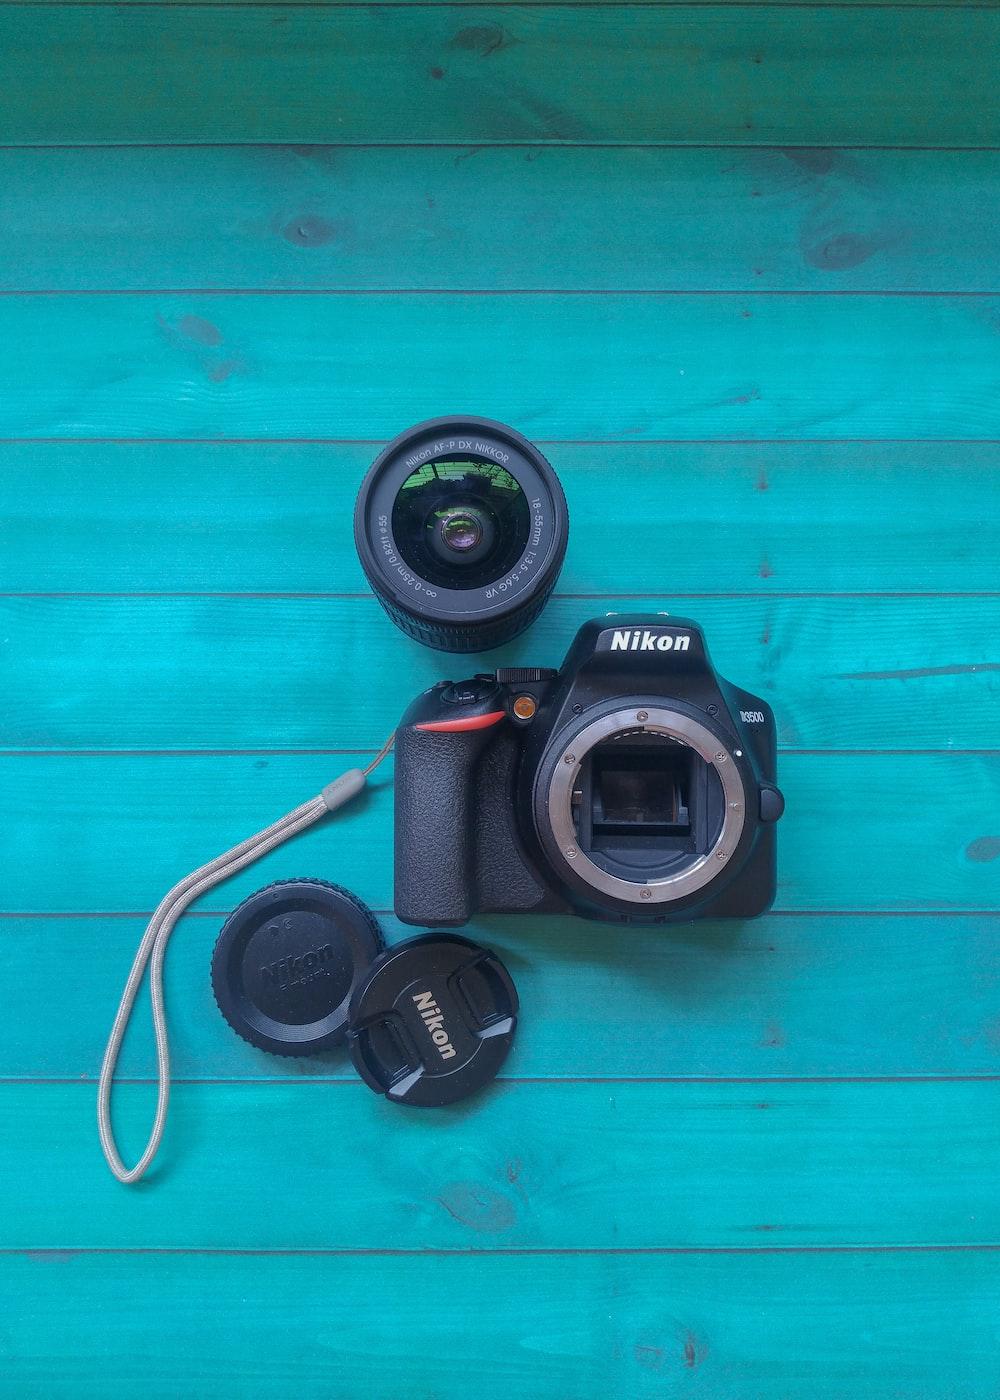 black nikon dslr camera on blue wooden surface